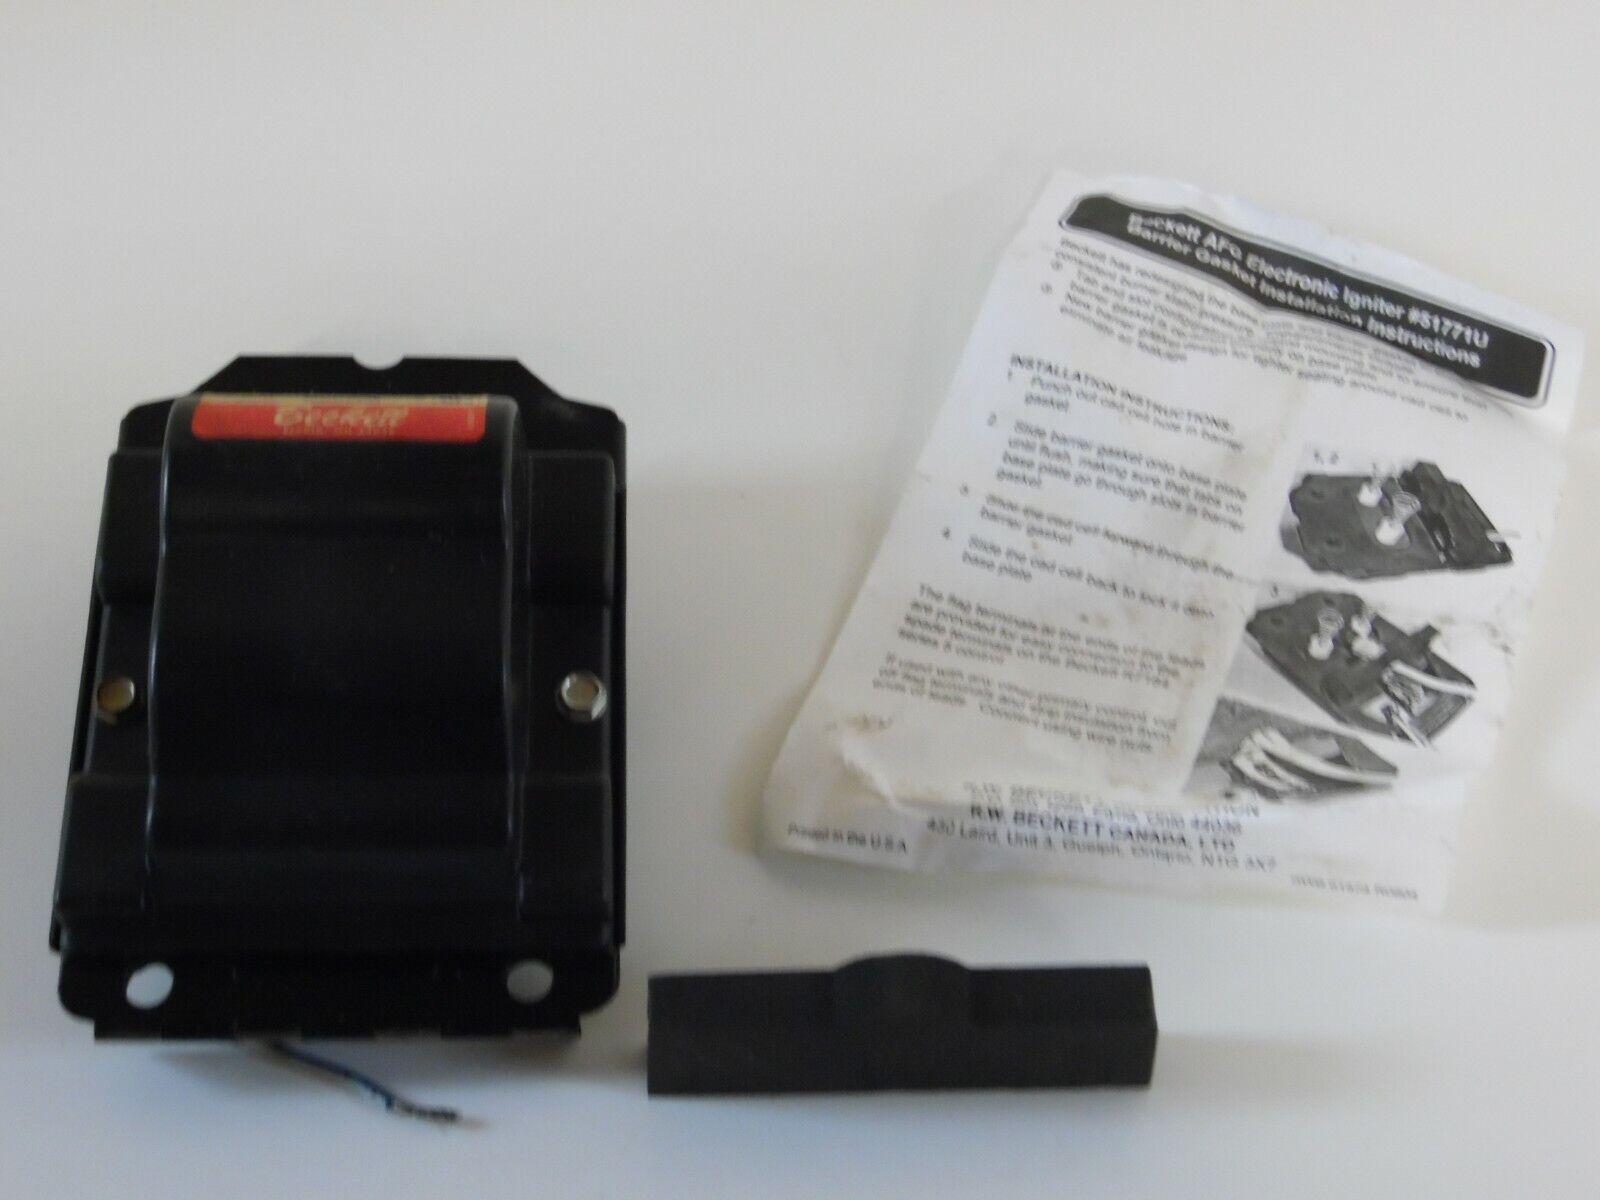 Borgward B 2000 0,75 T Thermostat Couvercle 071 302 56 01